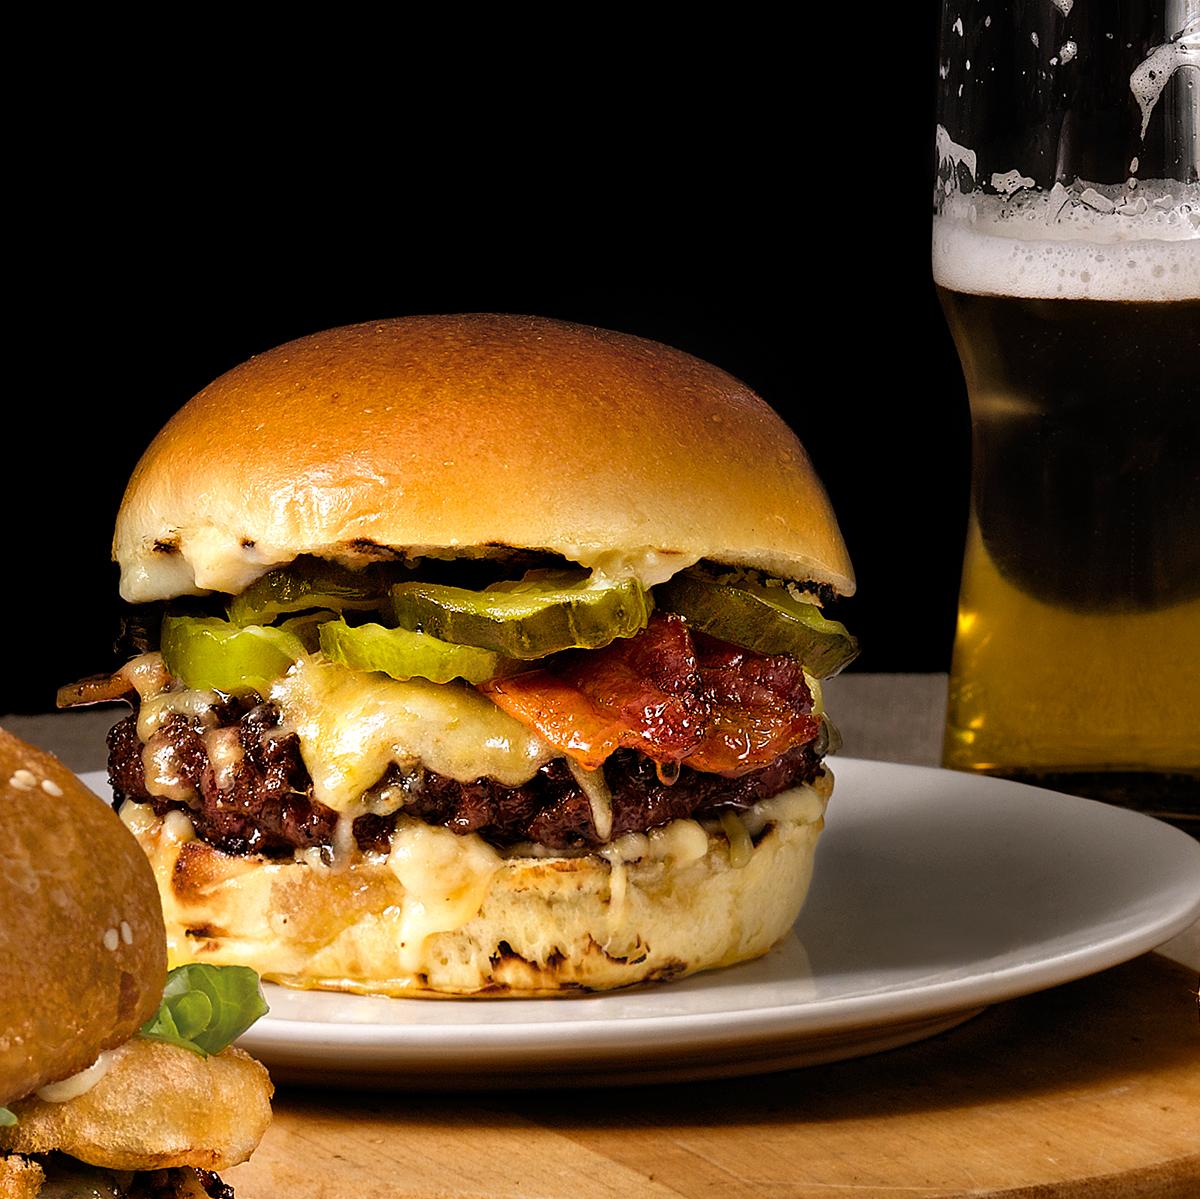 vie burger on plate